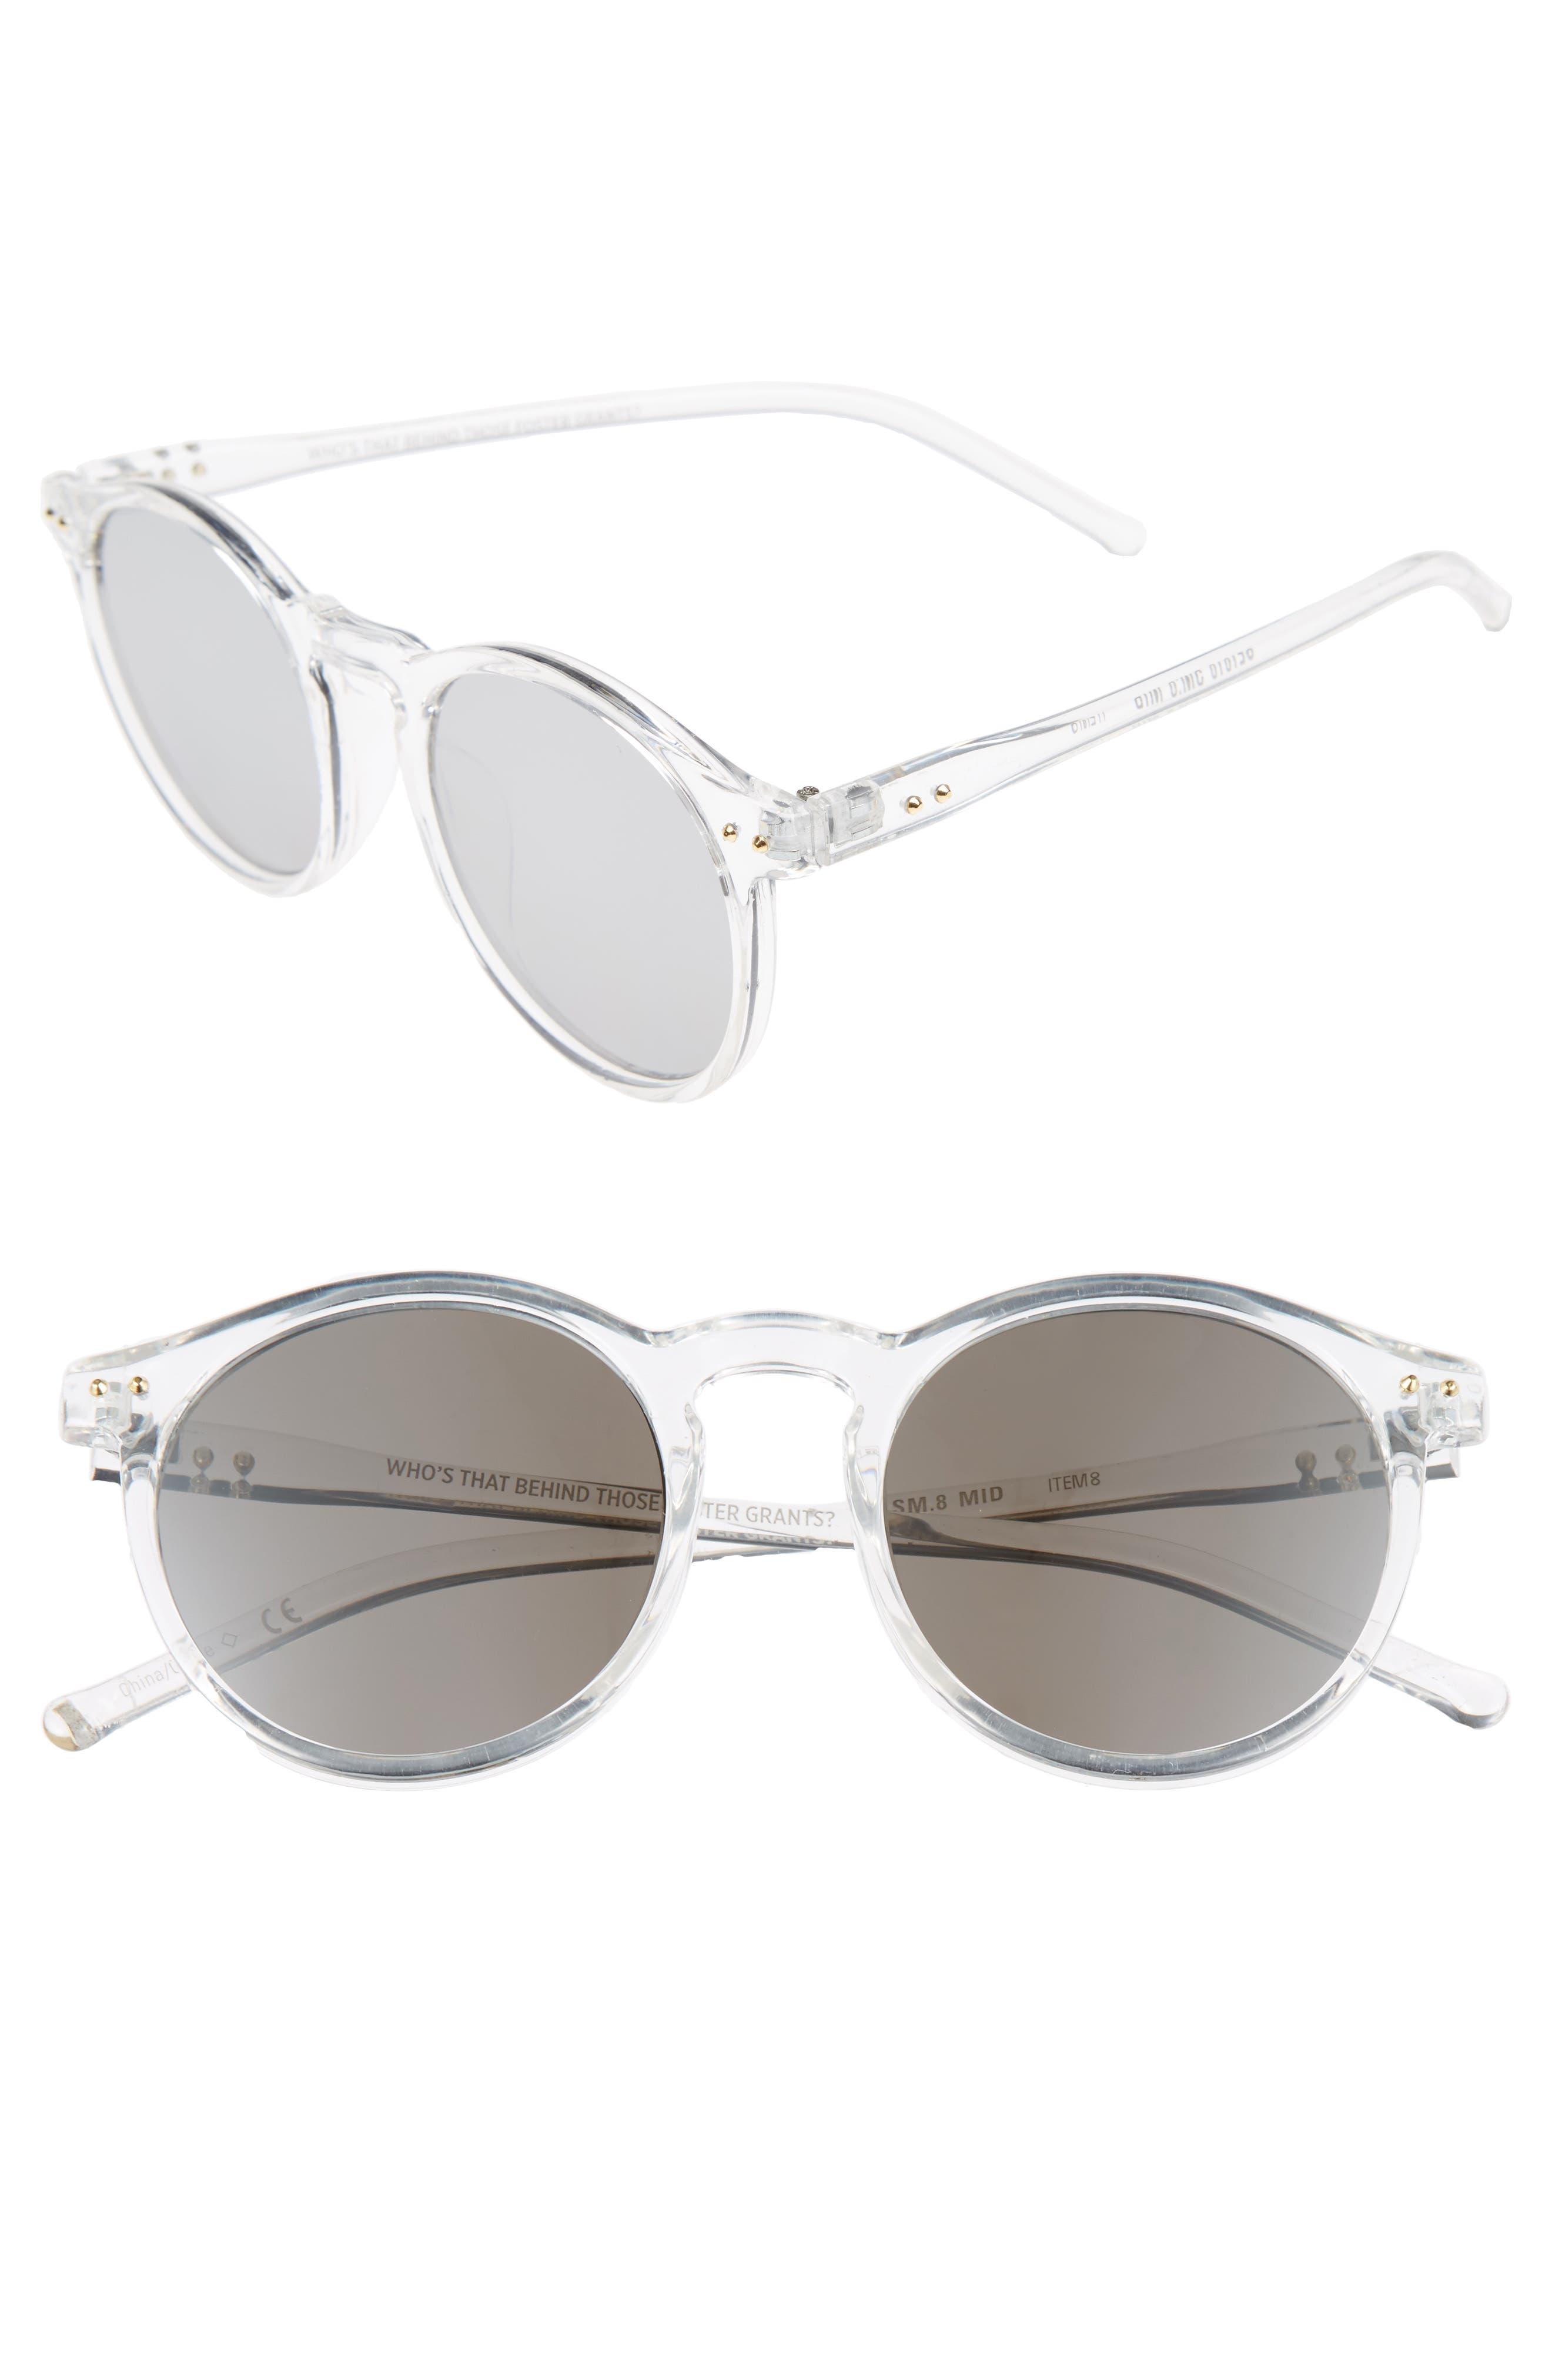 Main Image - Item 8 SM.8 52mm Sunglasses